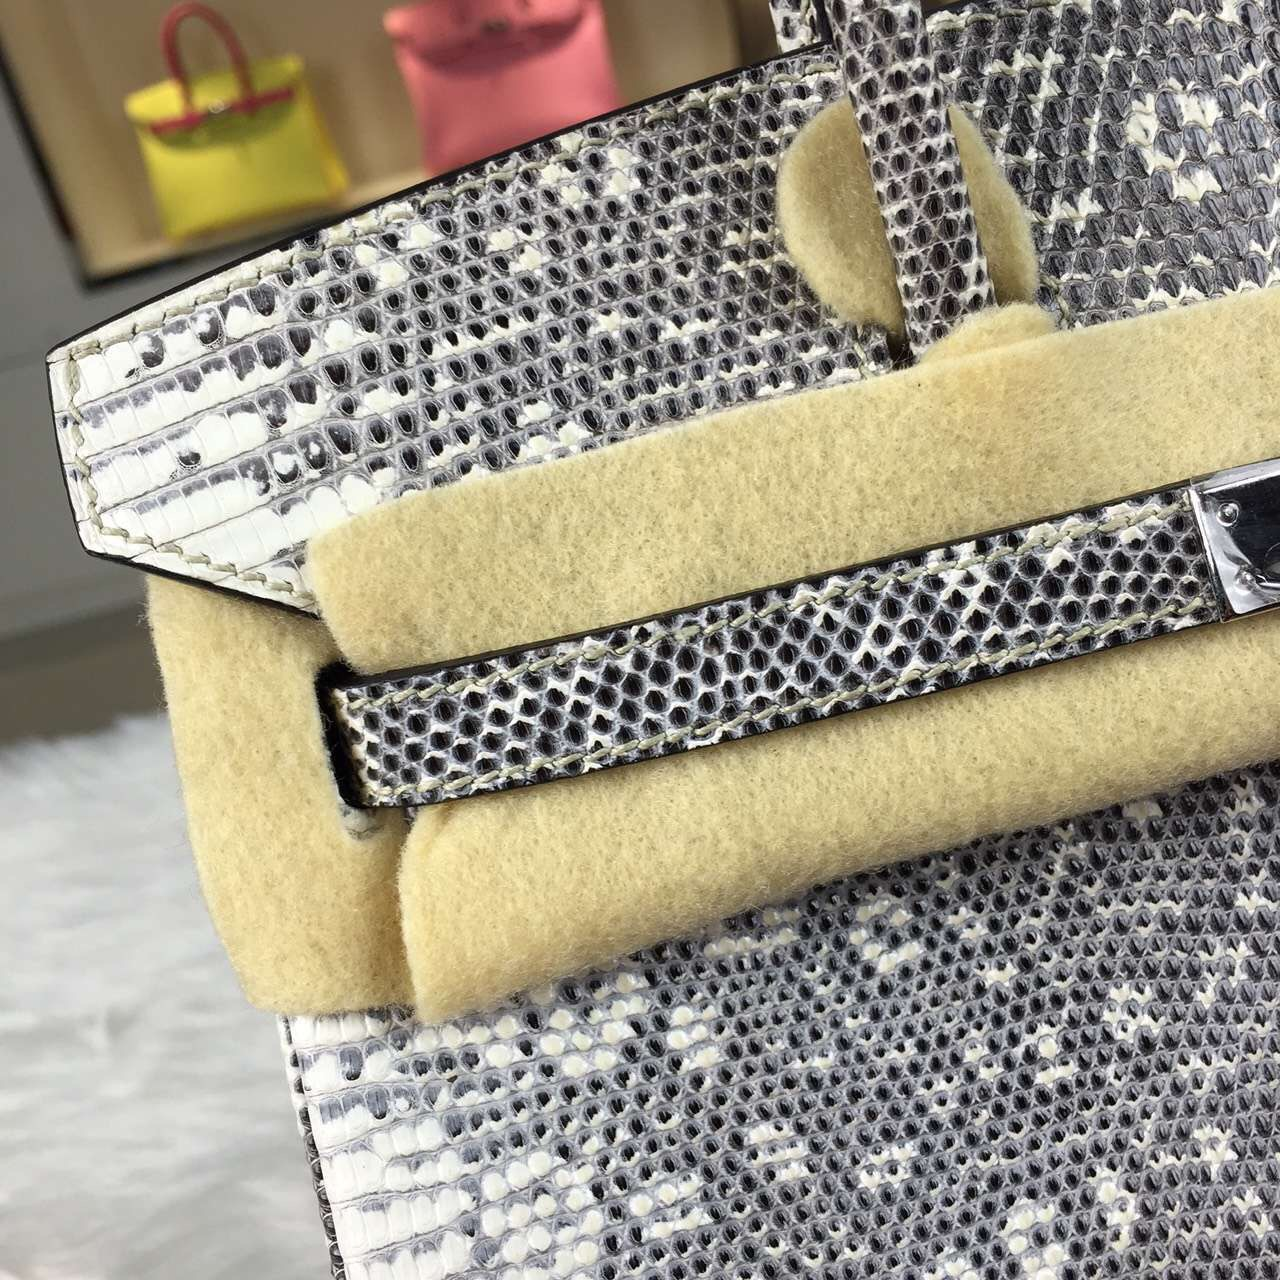 Online Shopping Hermes Original Color Lizard Skin Birkin Bag 25cm Silver Hardware